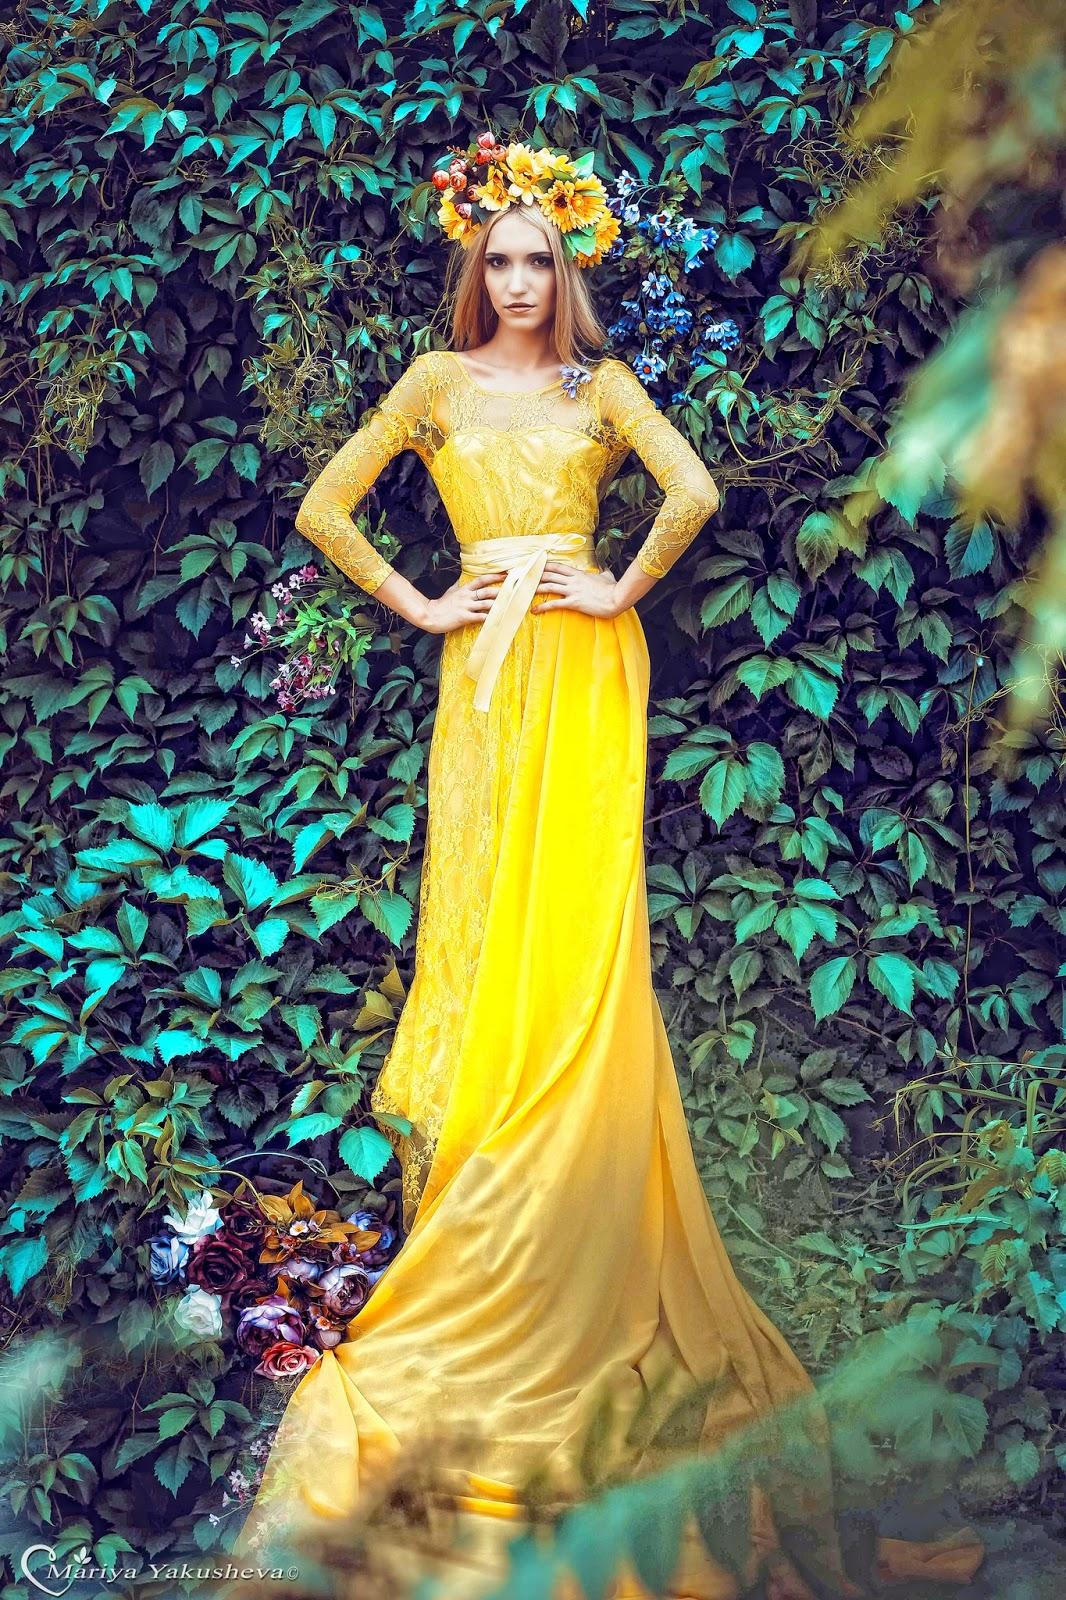 Якушева, Парамзина, фотошкола, Солотин, лето, платье